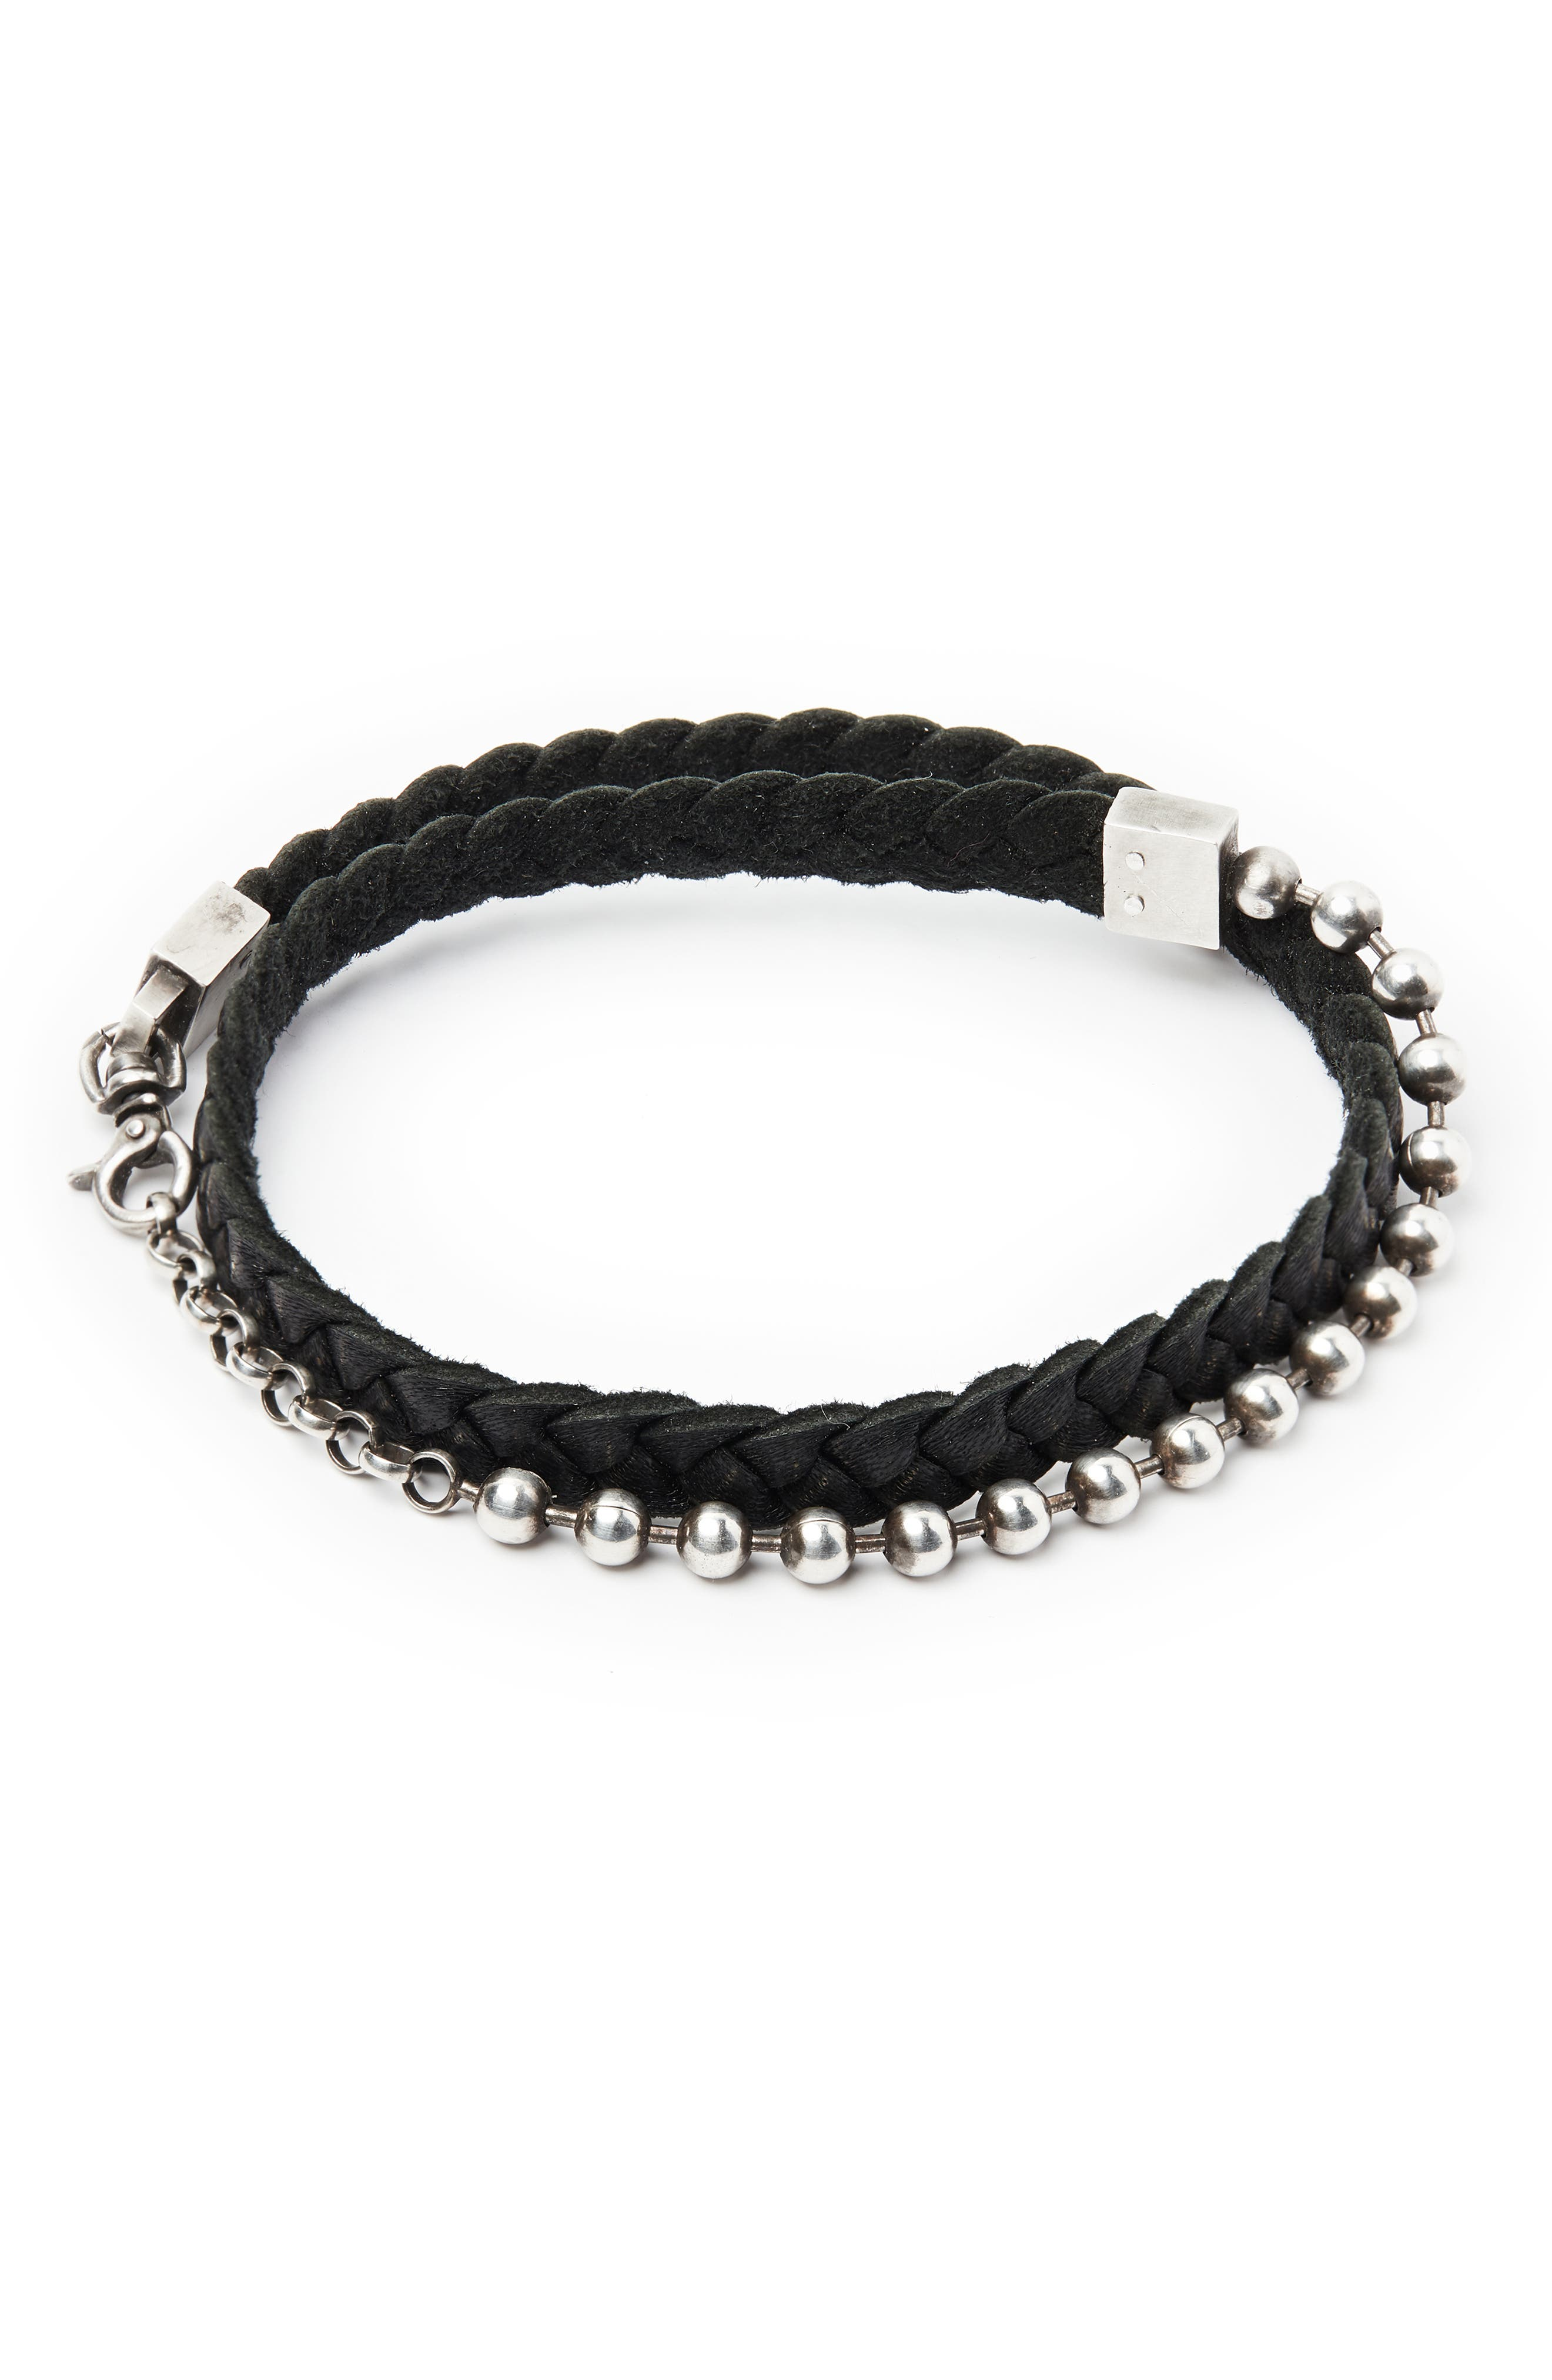 Leather & Sterling Silver Bracelet,                         Main,                         color, SILVER/ BLACK